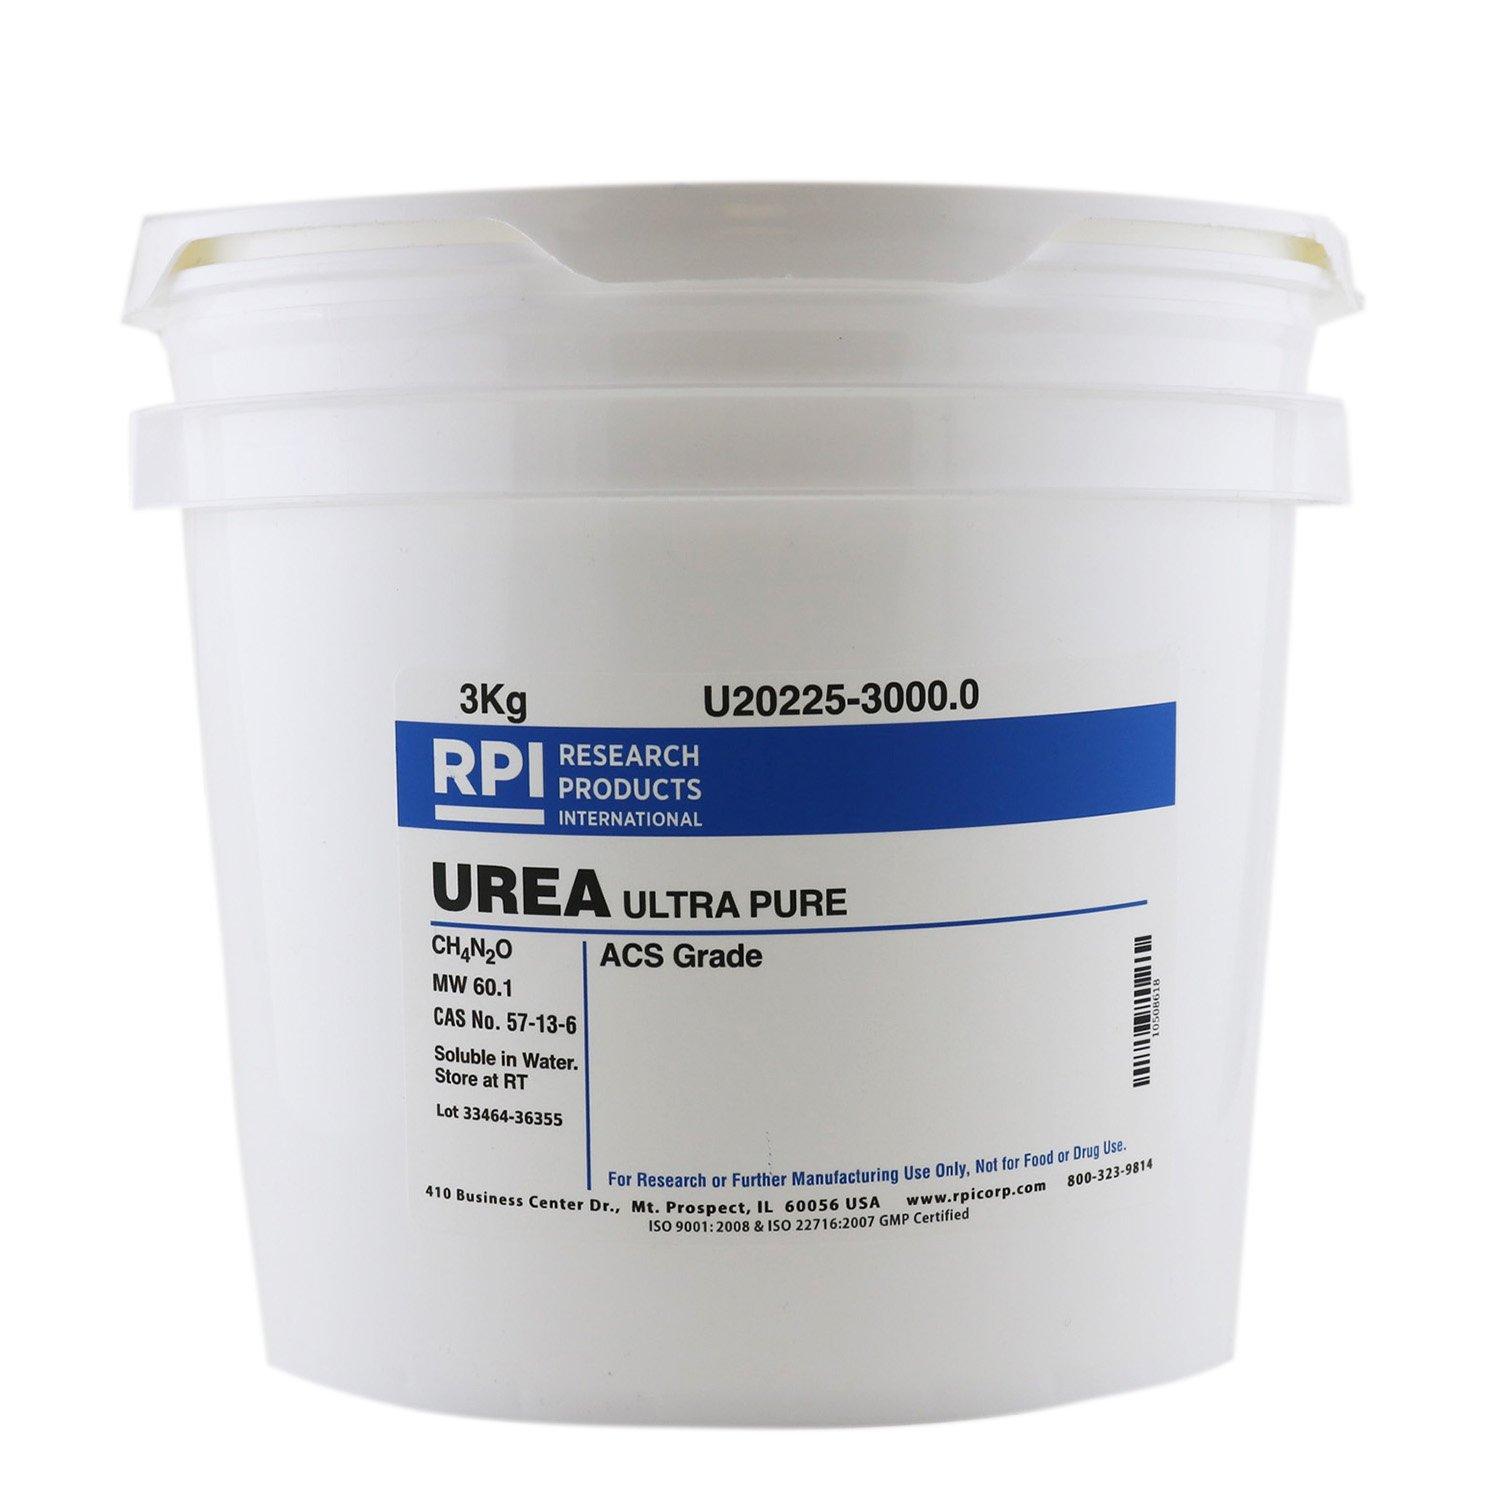 Urea [Carbamide], UltraPure (ACS Grade), 3 Kilograms